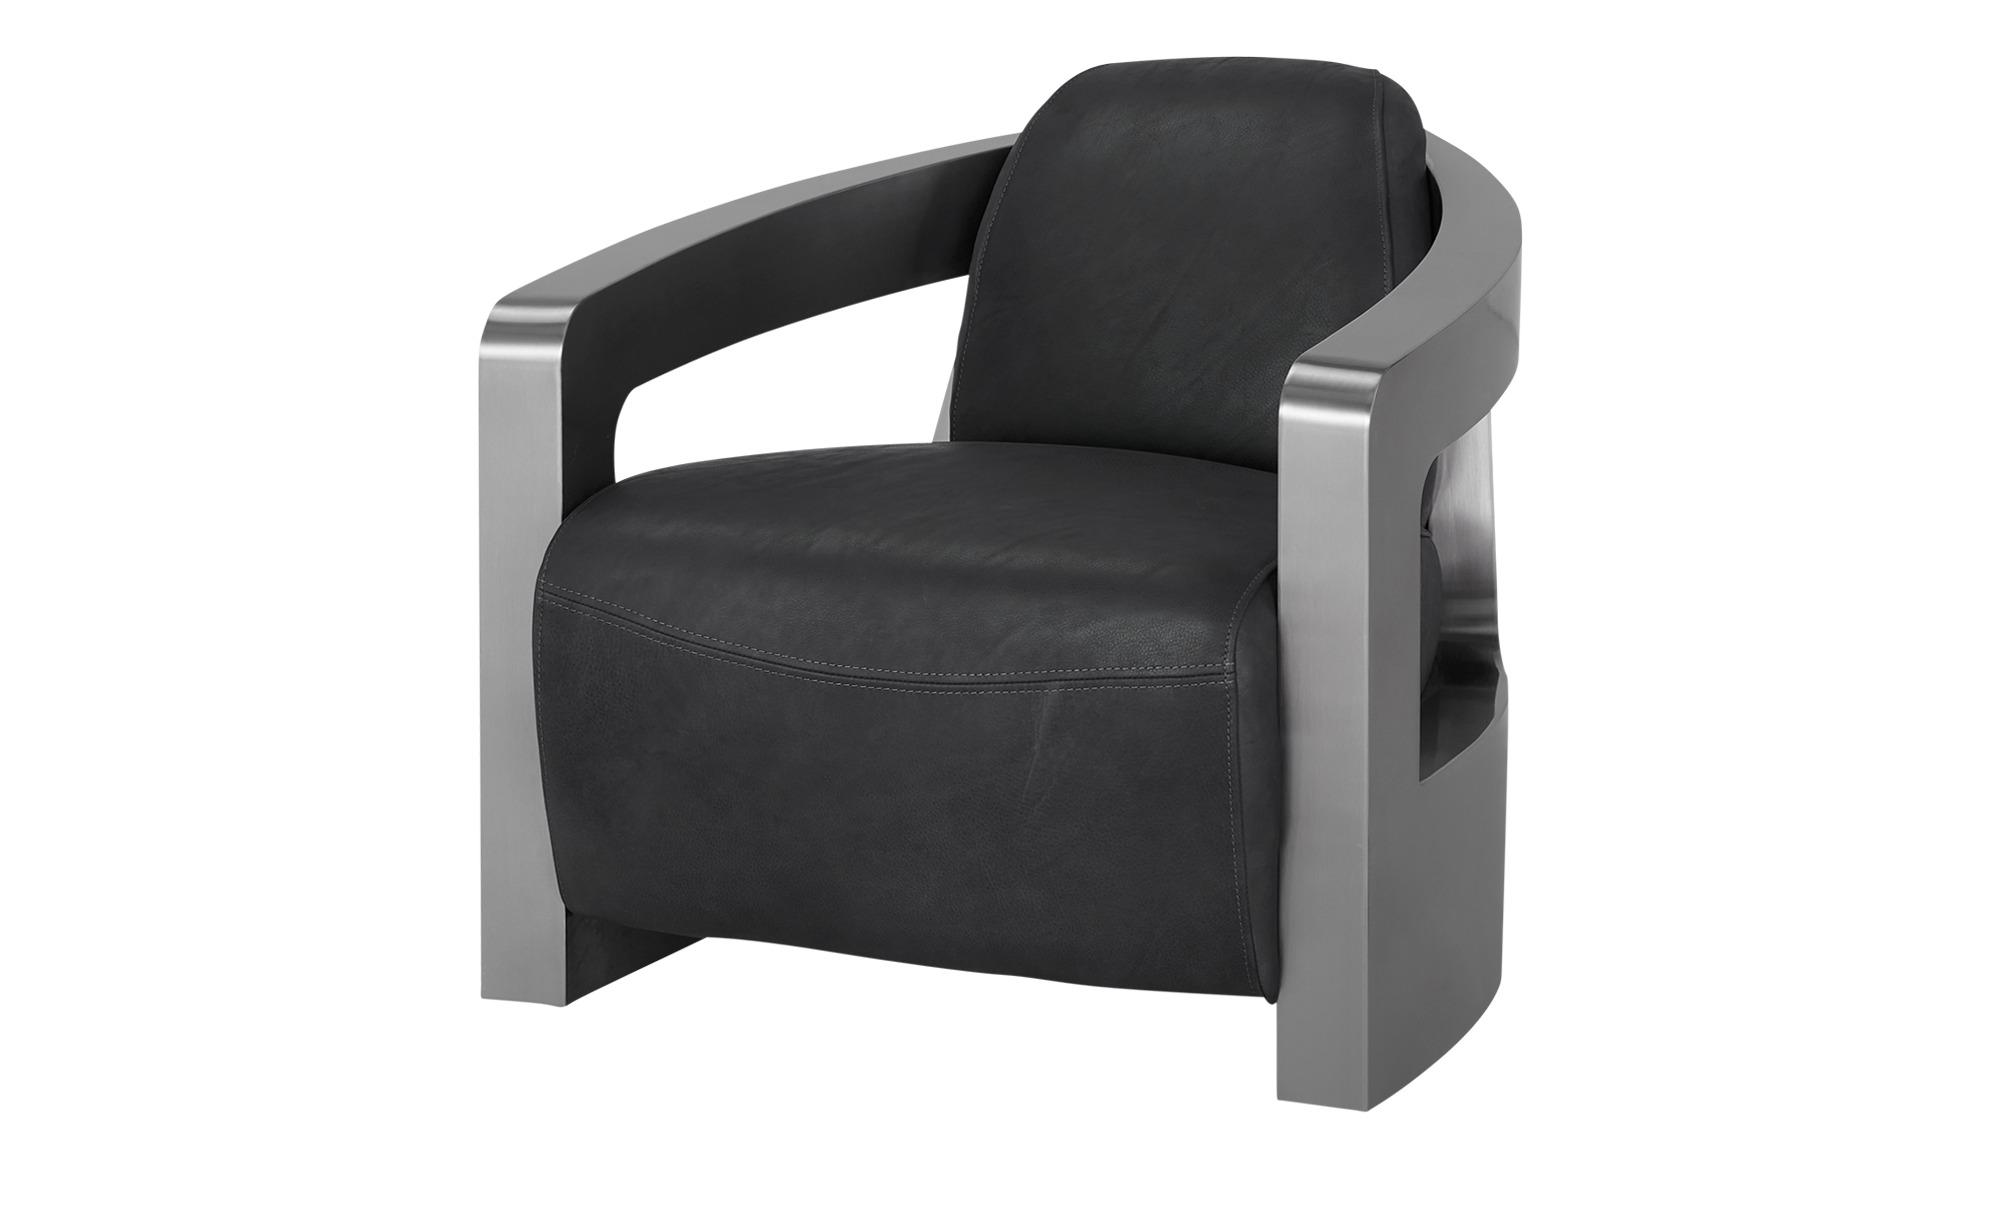 Sessel im Industriallook  Tyson ¦ grau ¦ Maße (cm): B: 76 H: 70 T: 85 Polstermöbel > Sessel > Ledersessel - Höffner